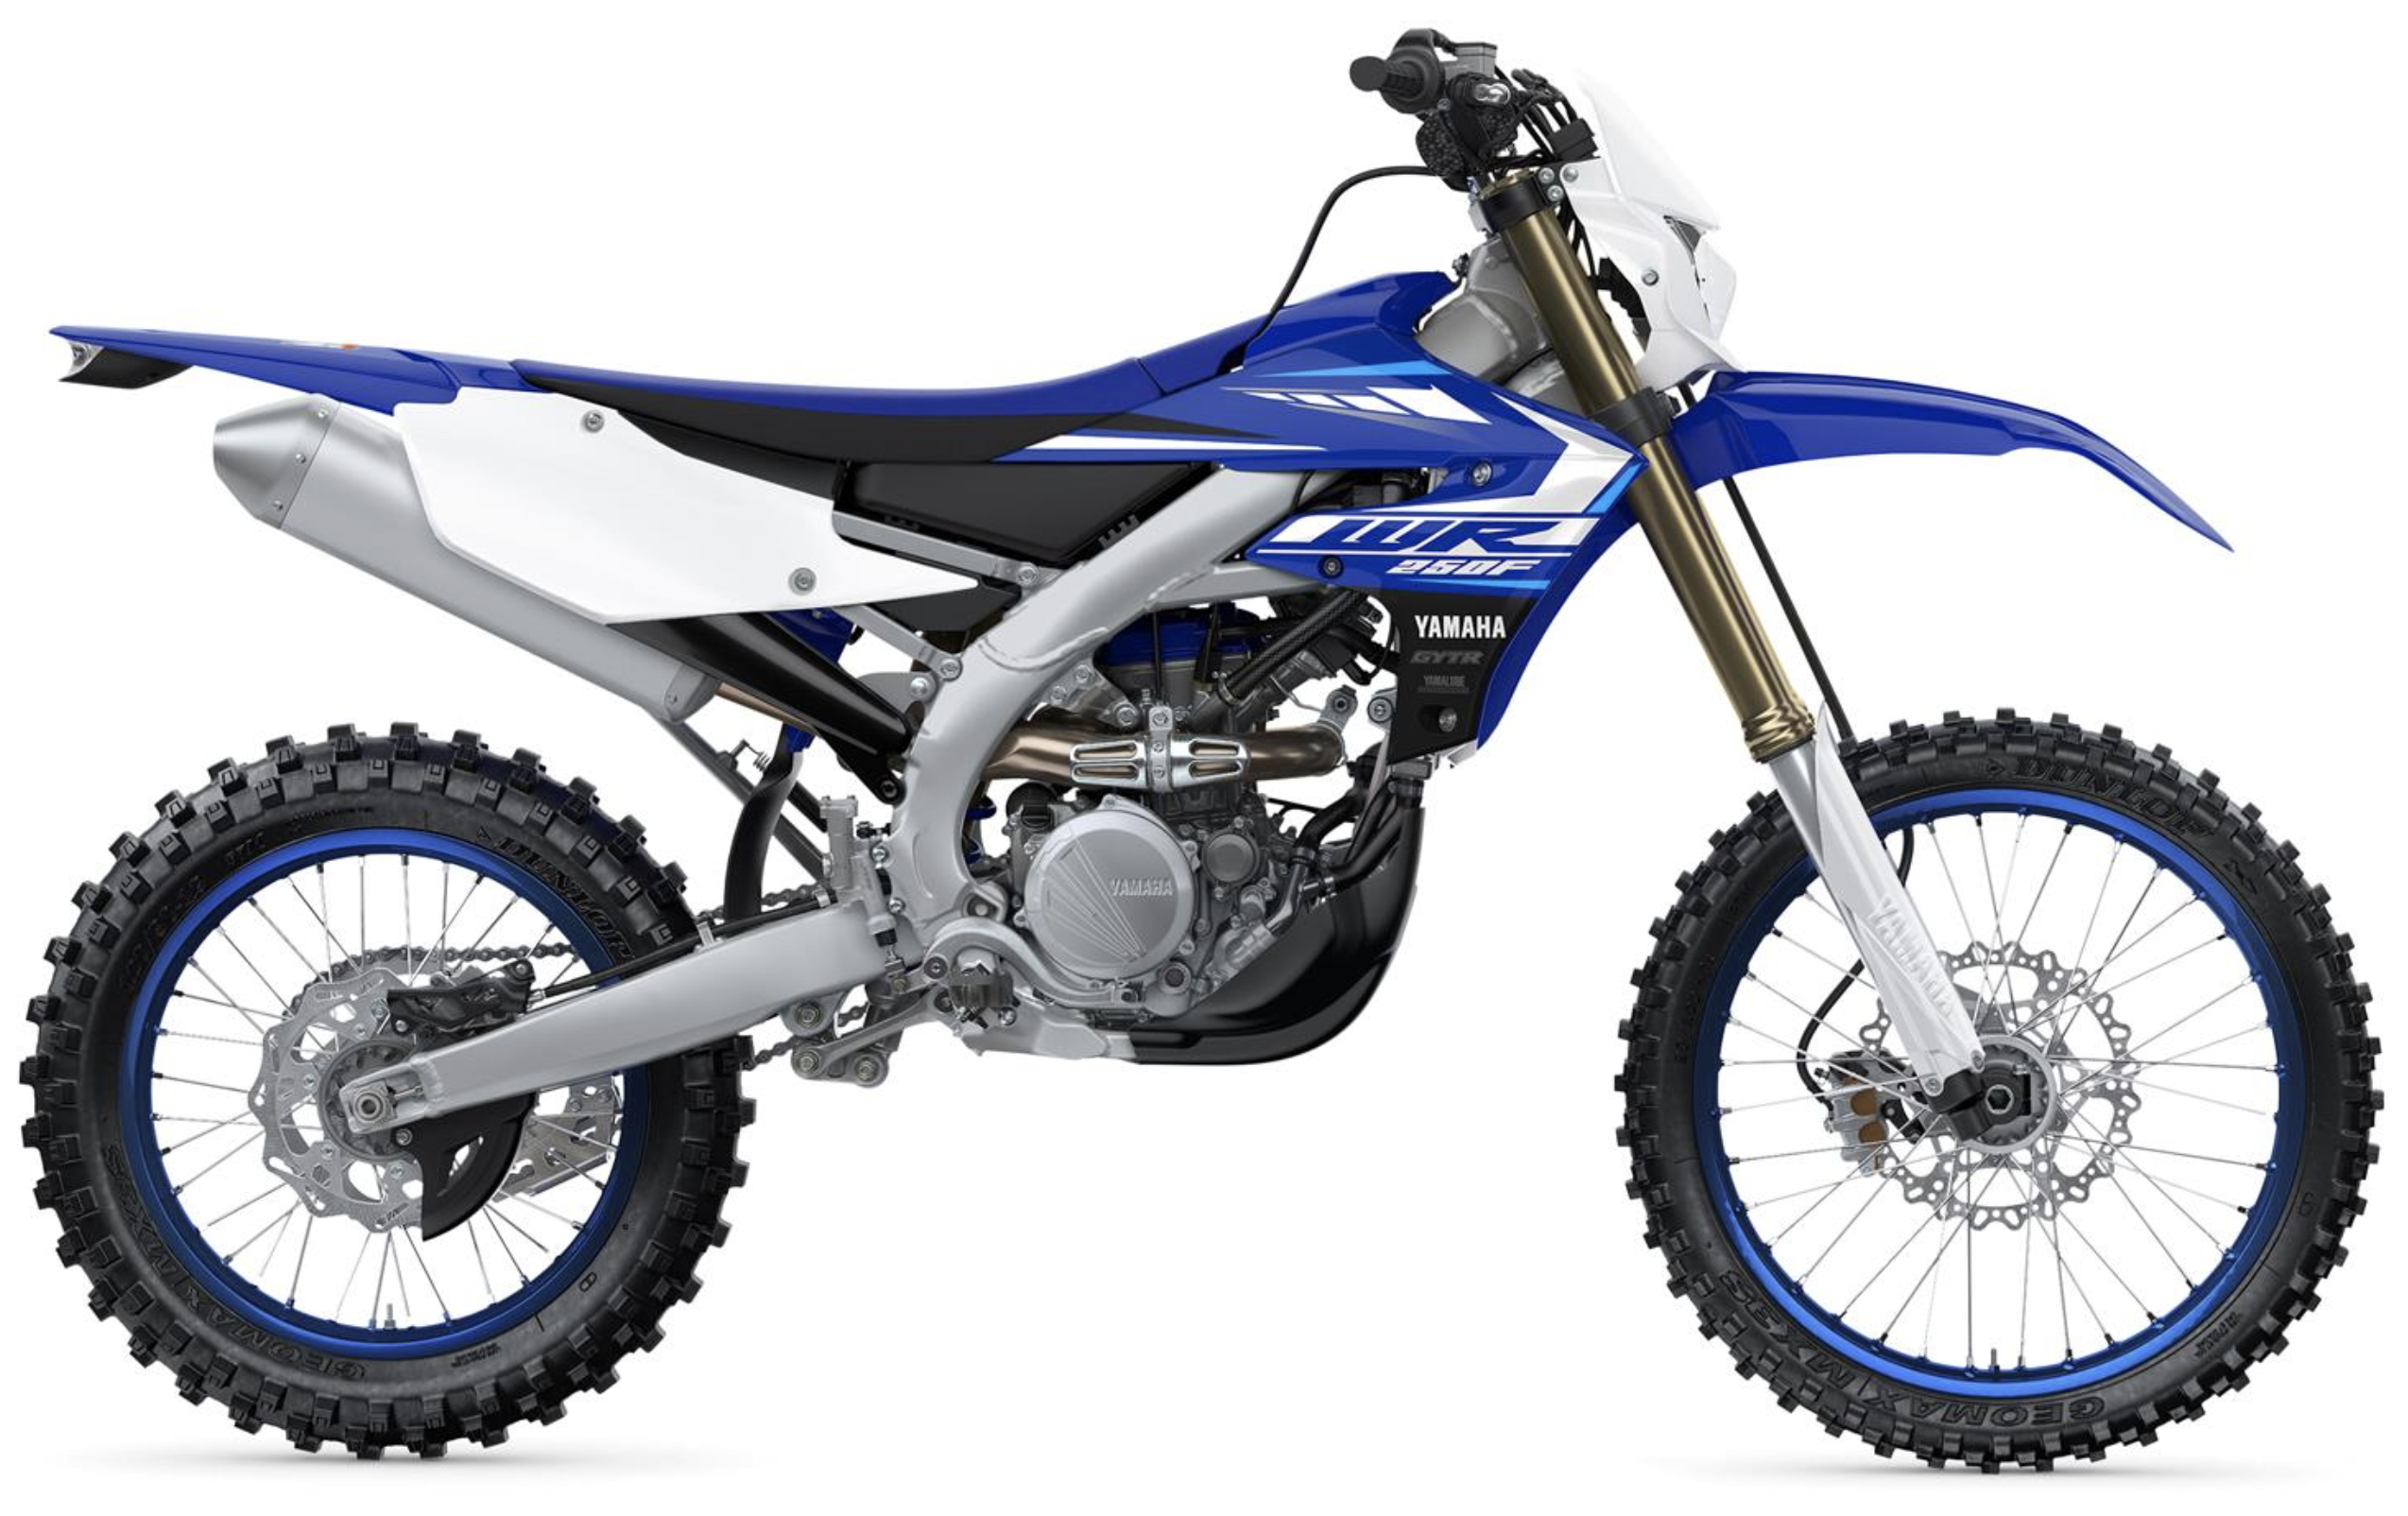 2020 Yamaha Adult Enduro dirt bike